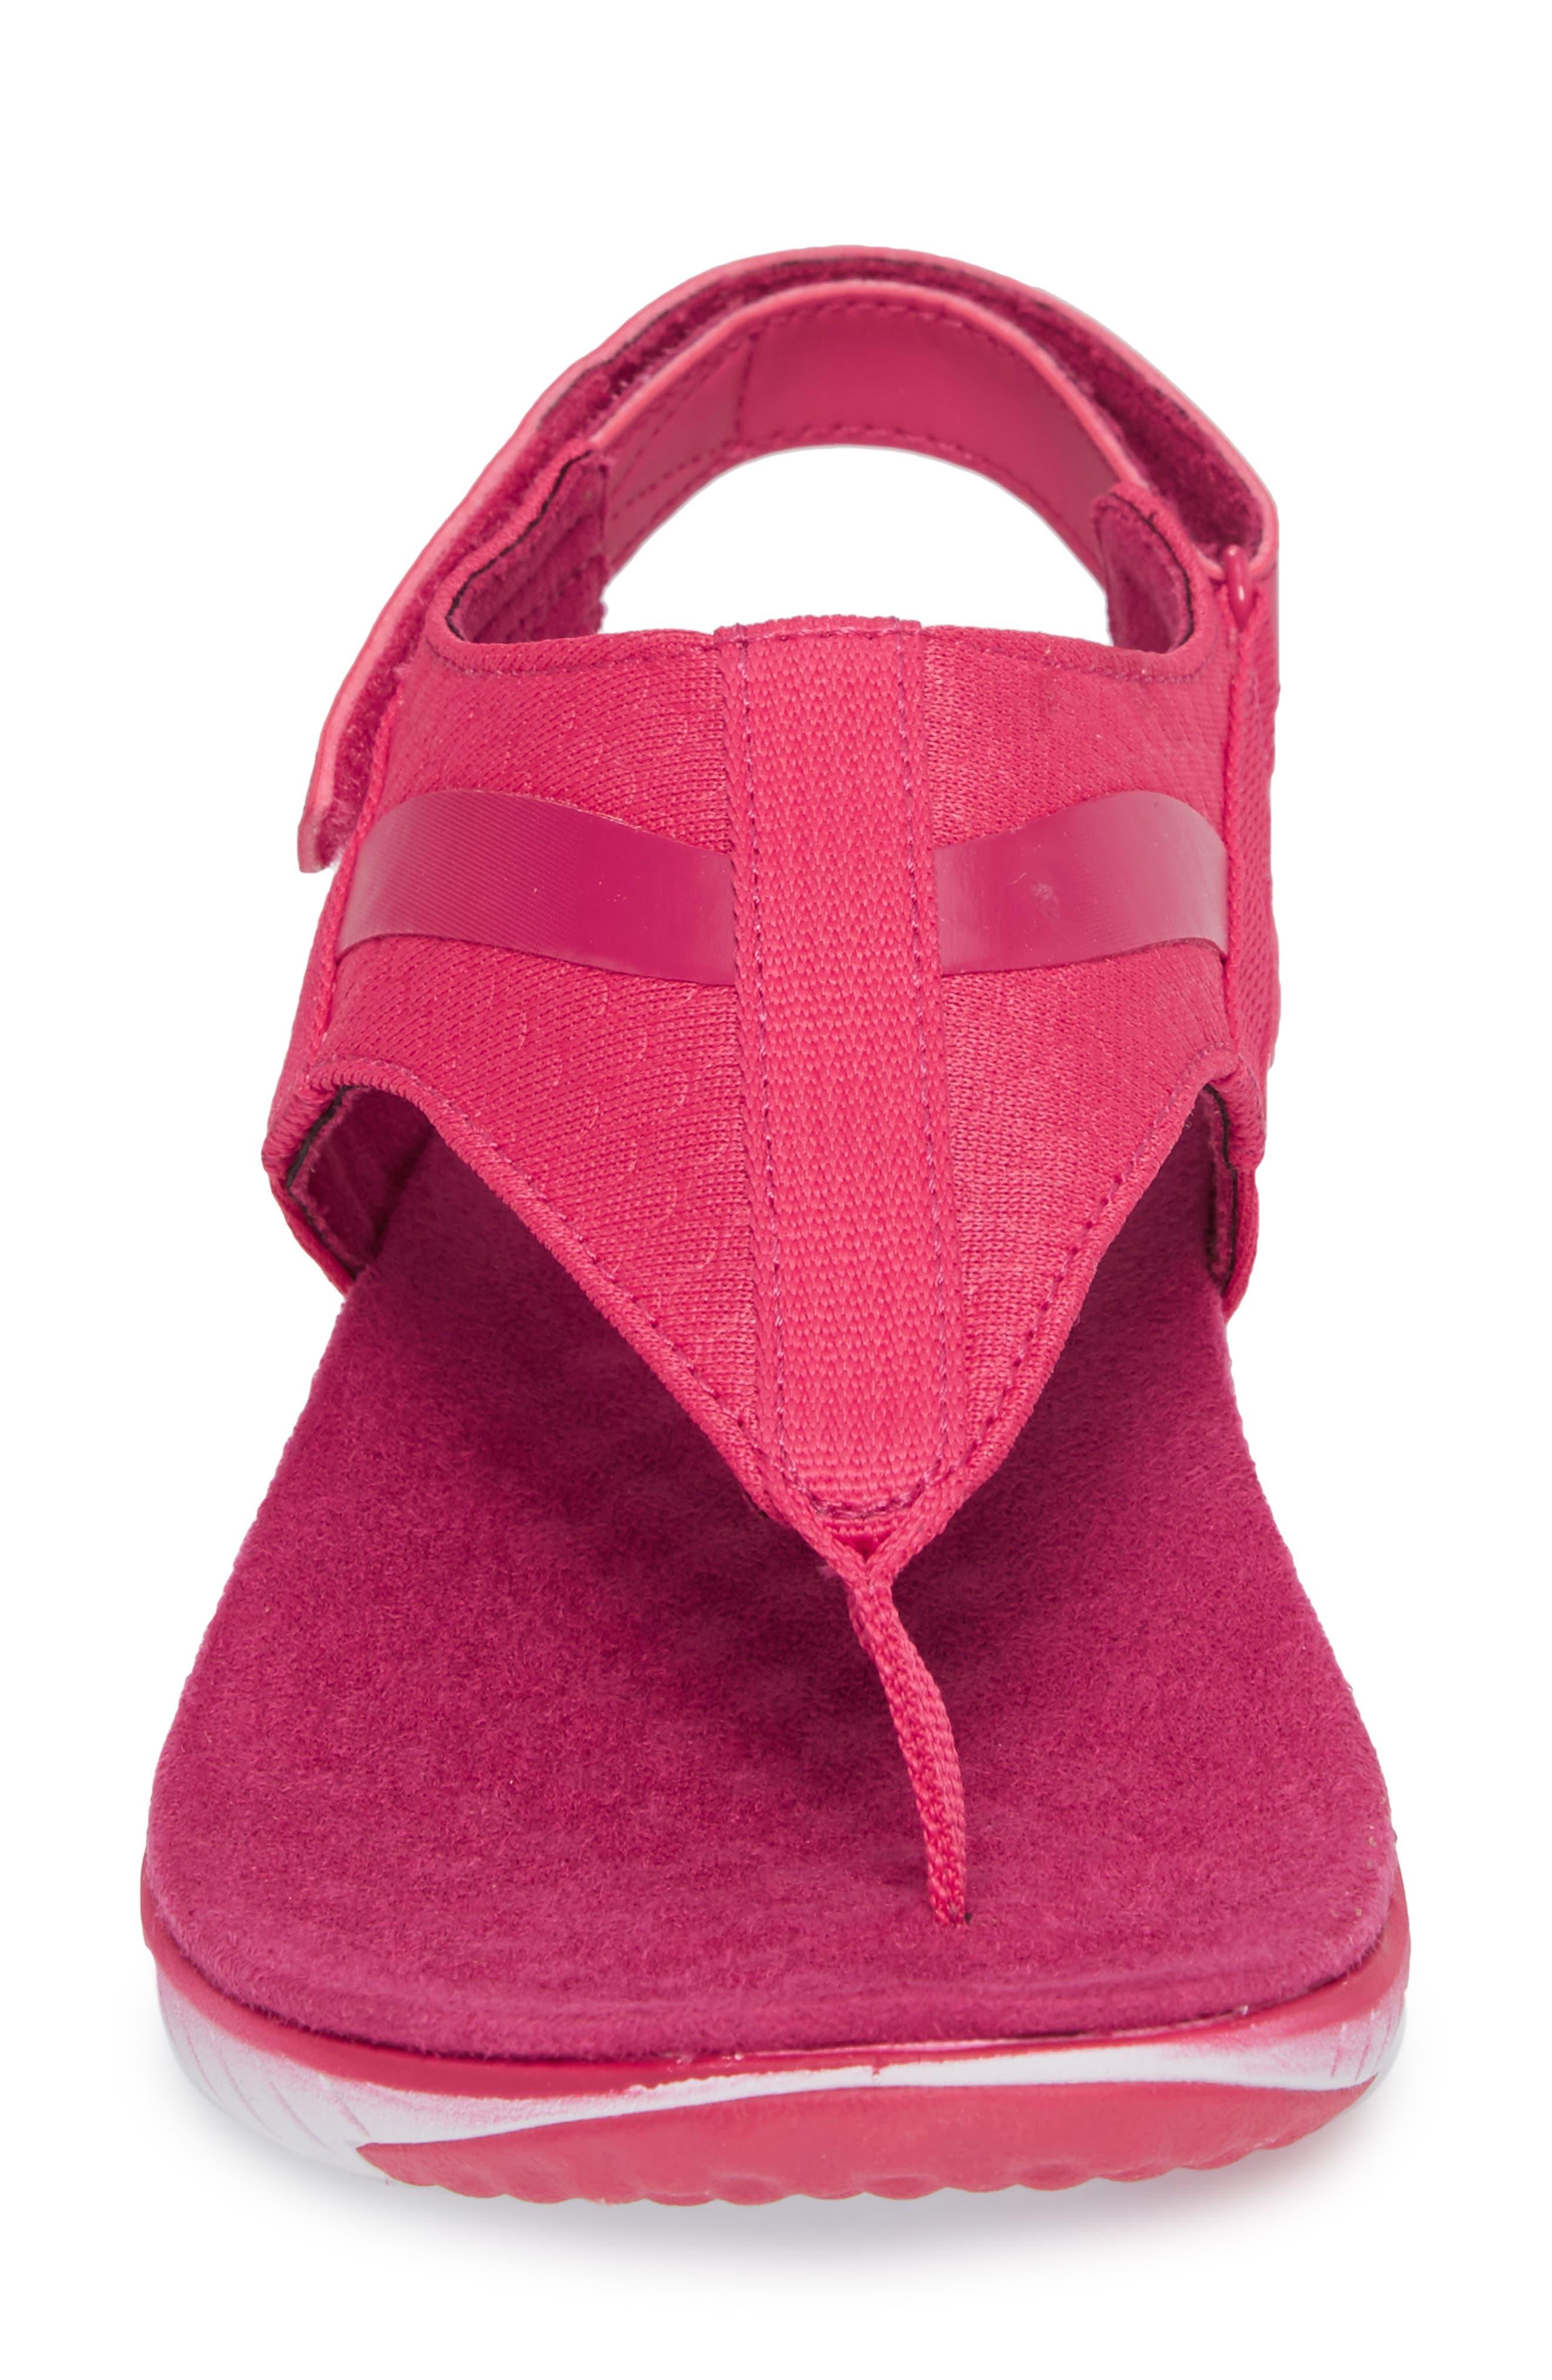 1SIX8 Linna Slide Air Cushion+ Sandal,                             Alternate thumbnail 16, color,